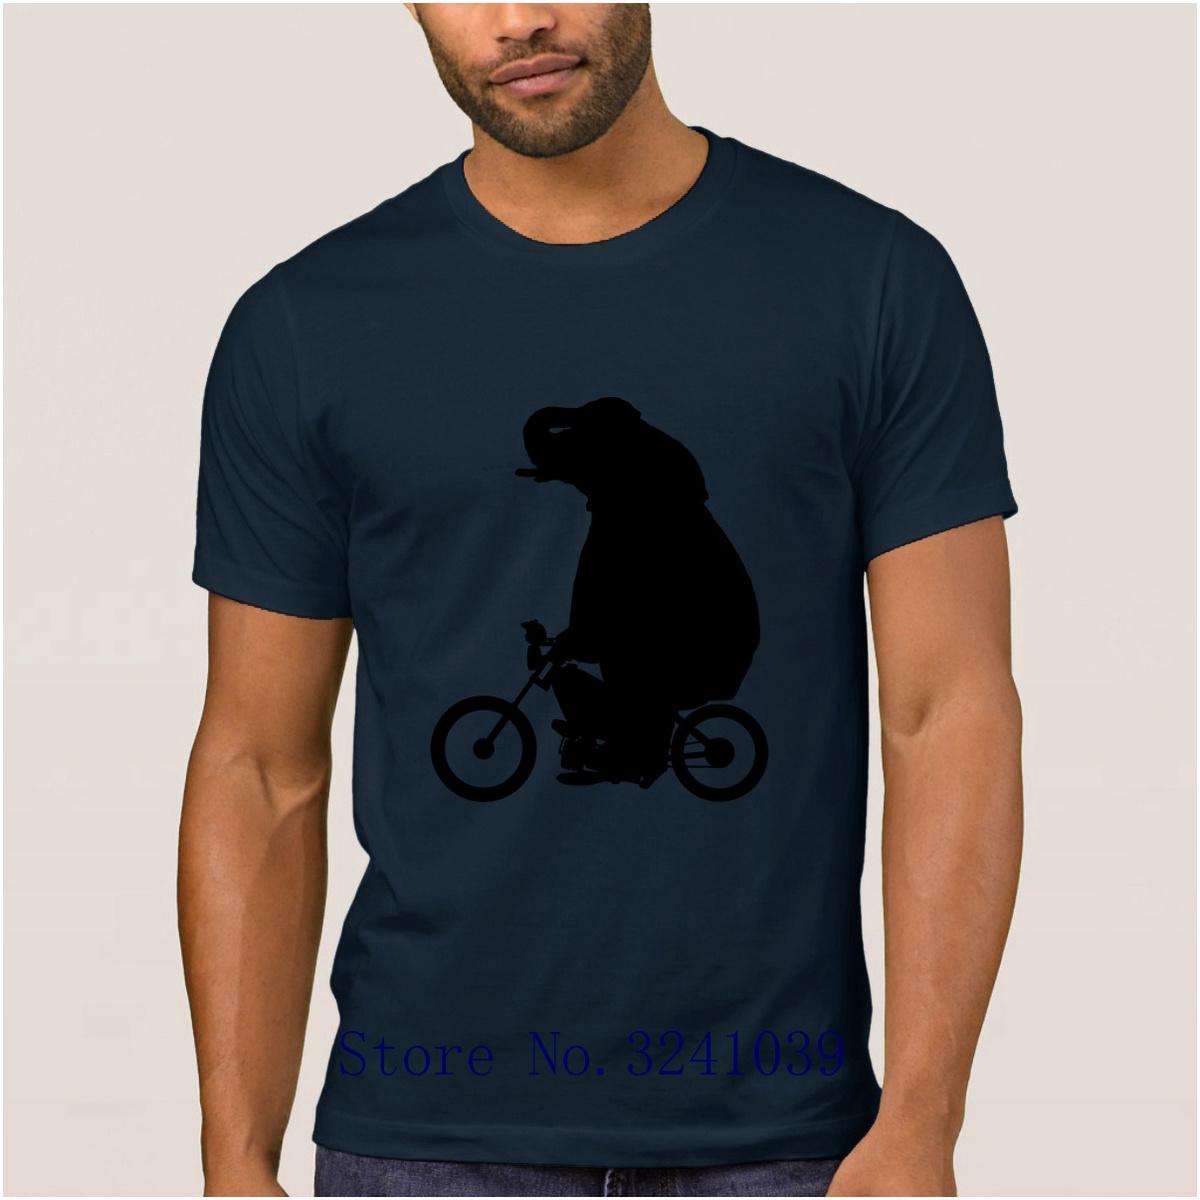 La Maxpa индивидуальные Юмор Дружба за пределами границ вектор футболка для мужчин 2017 фитнес футболка новинка футболка мужская